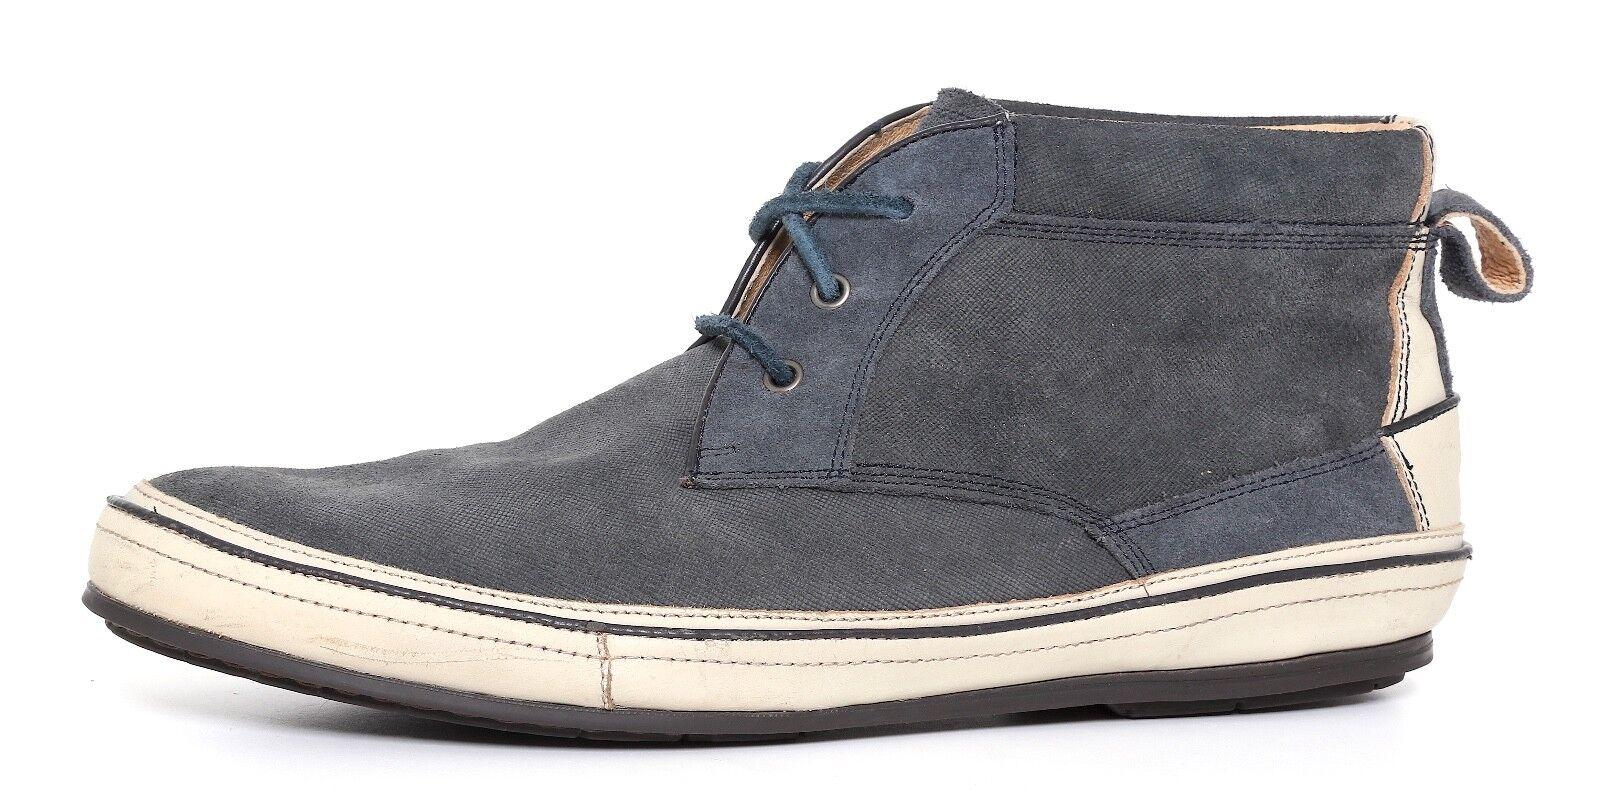 John Varvatos Tobillo botas Gamuza Azul Marino Hombre M 1137